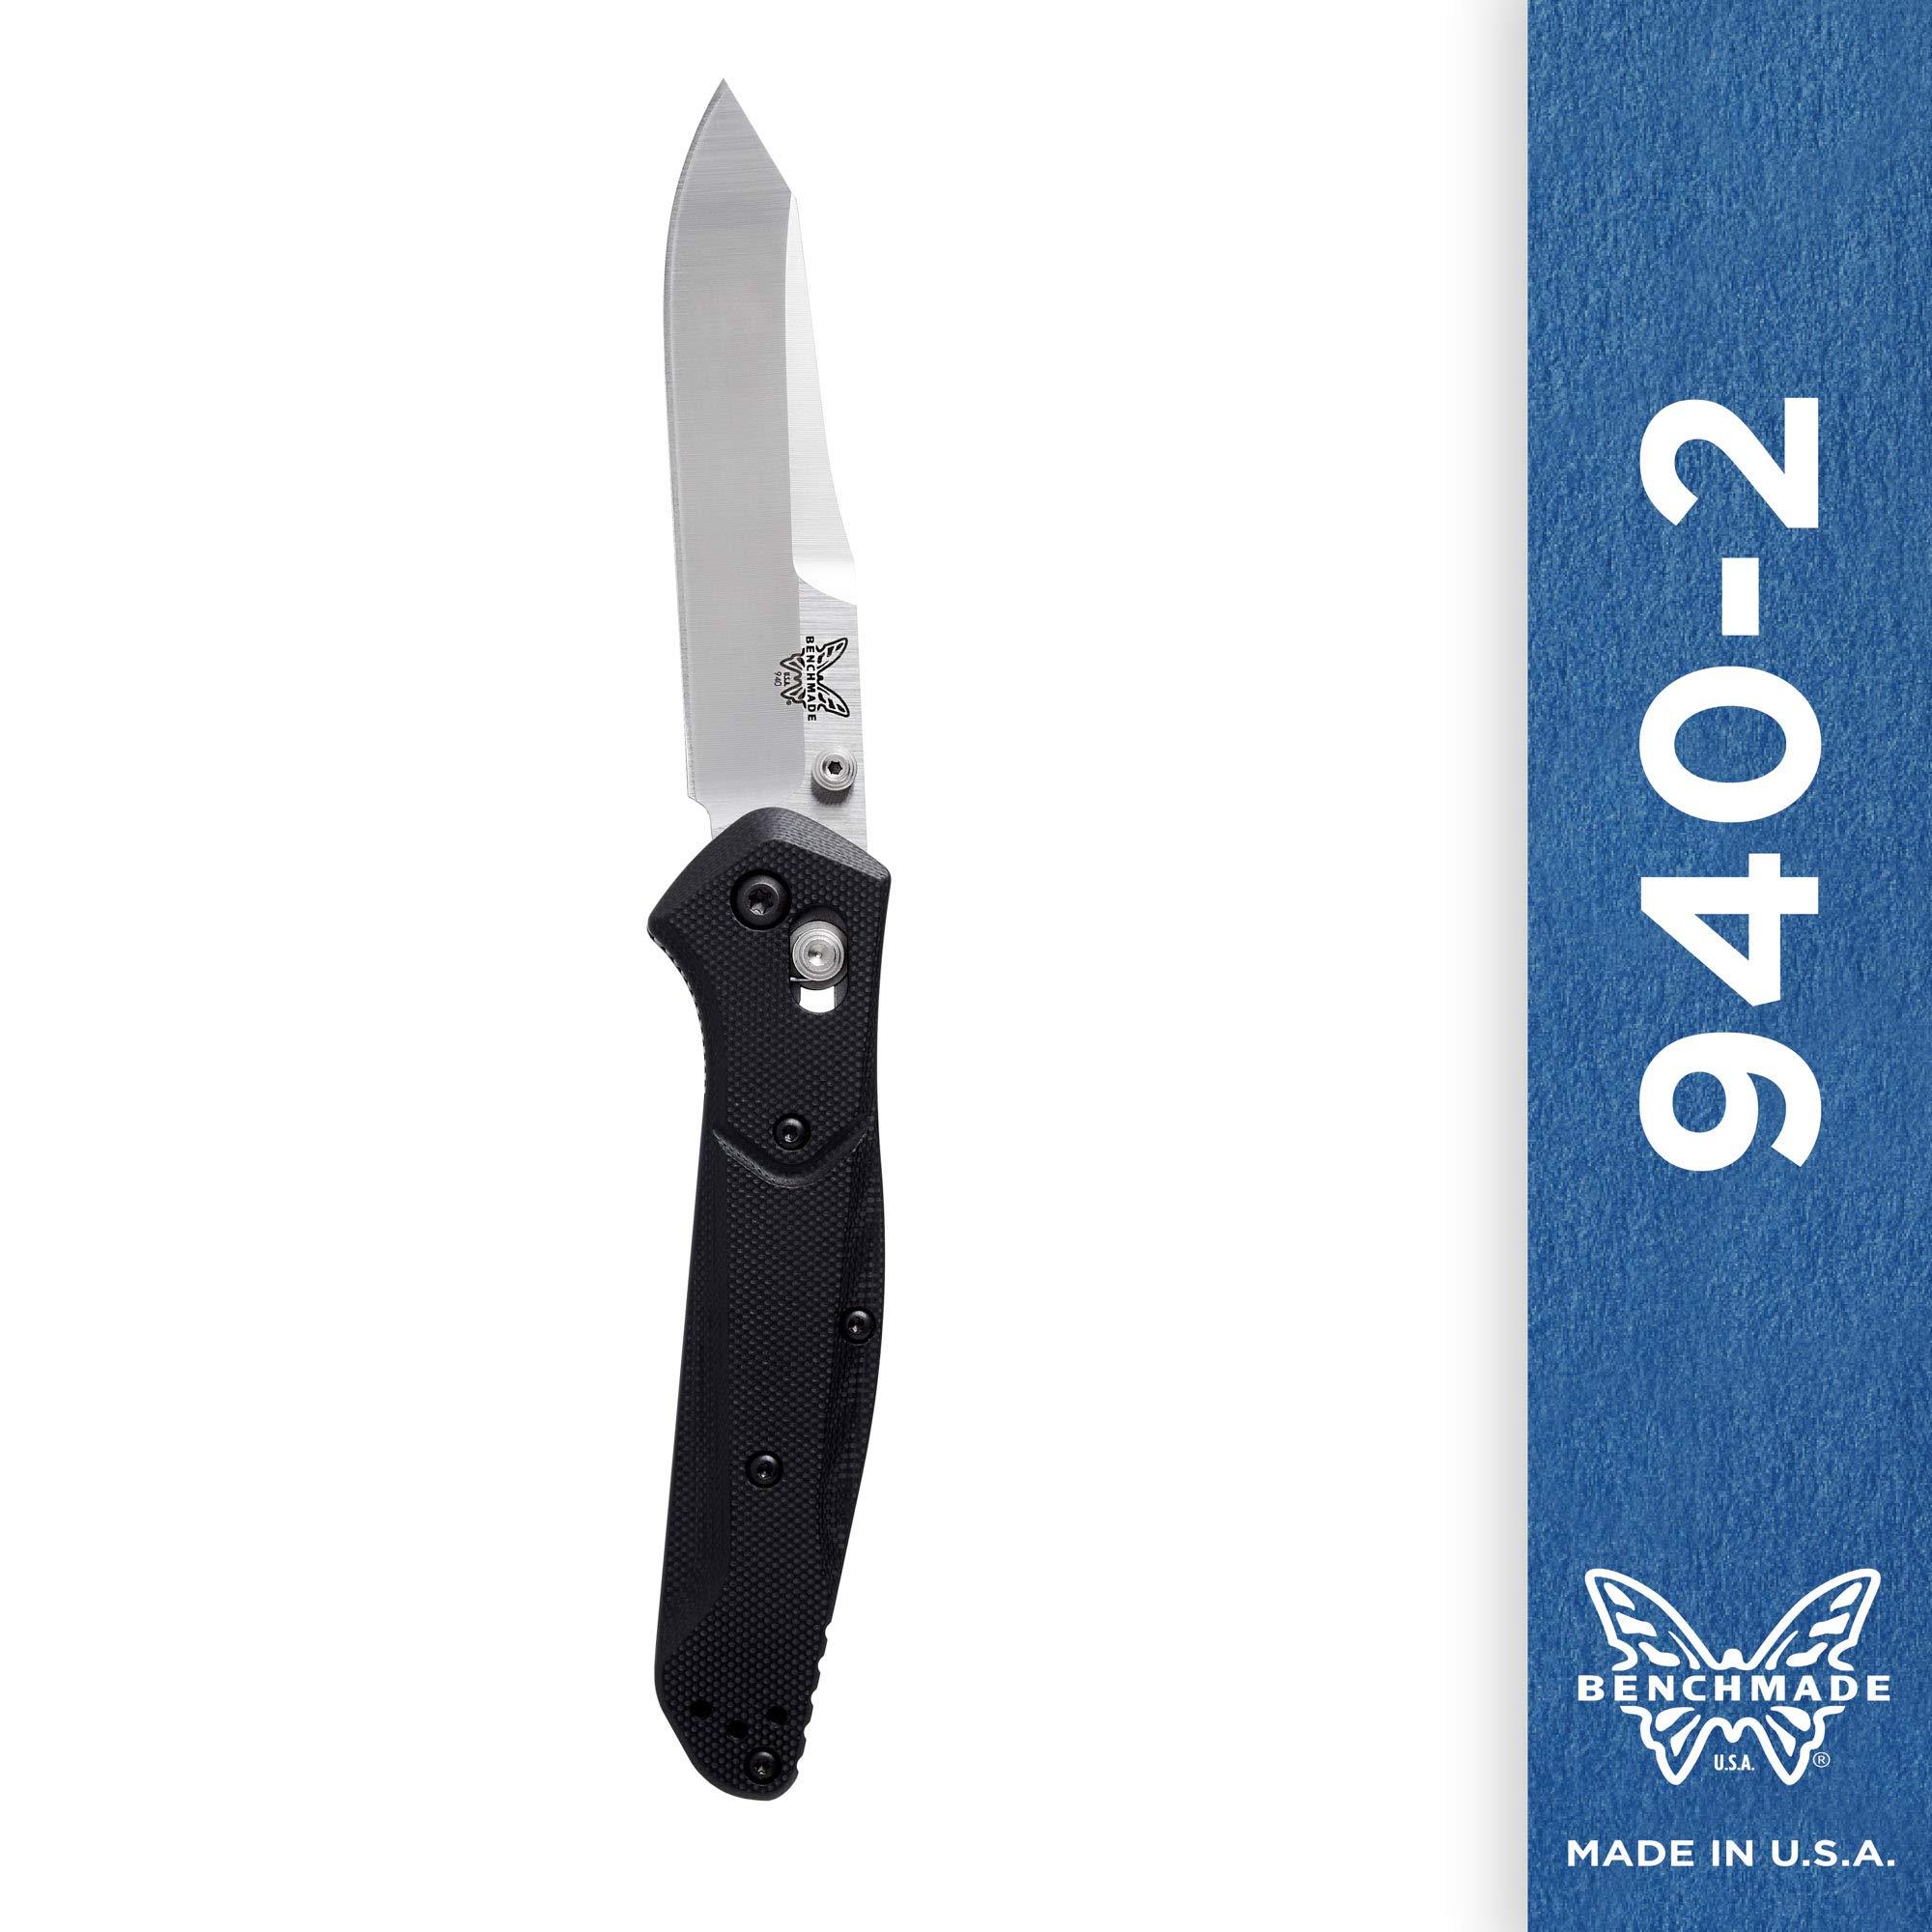 Benchmade - 940-2 Knife, Reverse Tanto Blade, Plain Edge, Satin Finish, G10 Handle by Benchmade